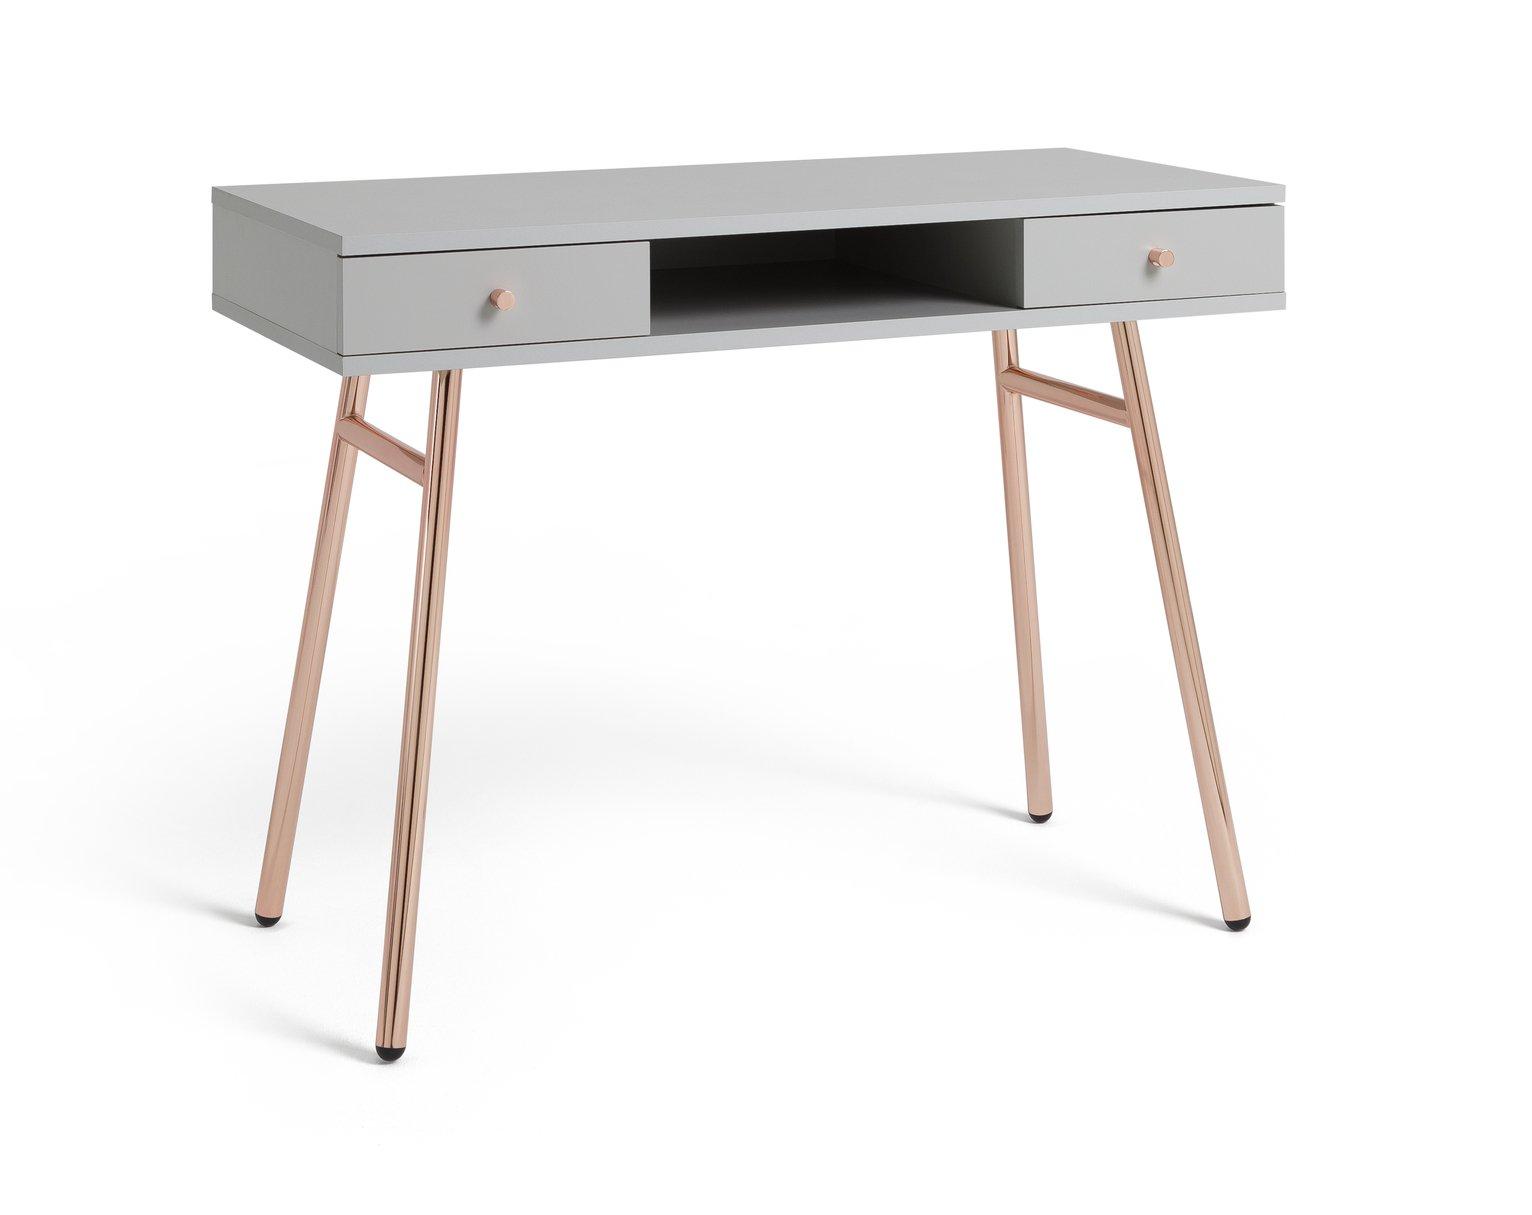 Argos Home Valence Desk - Rose Gold